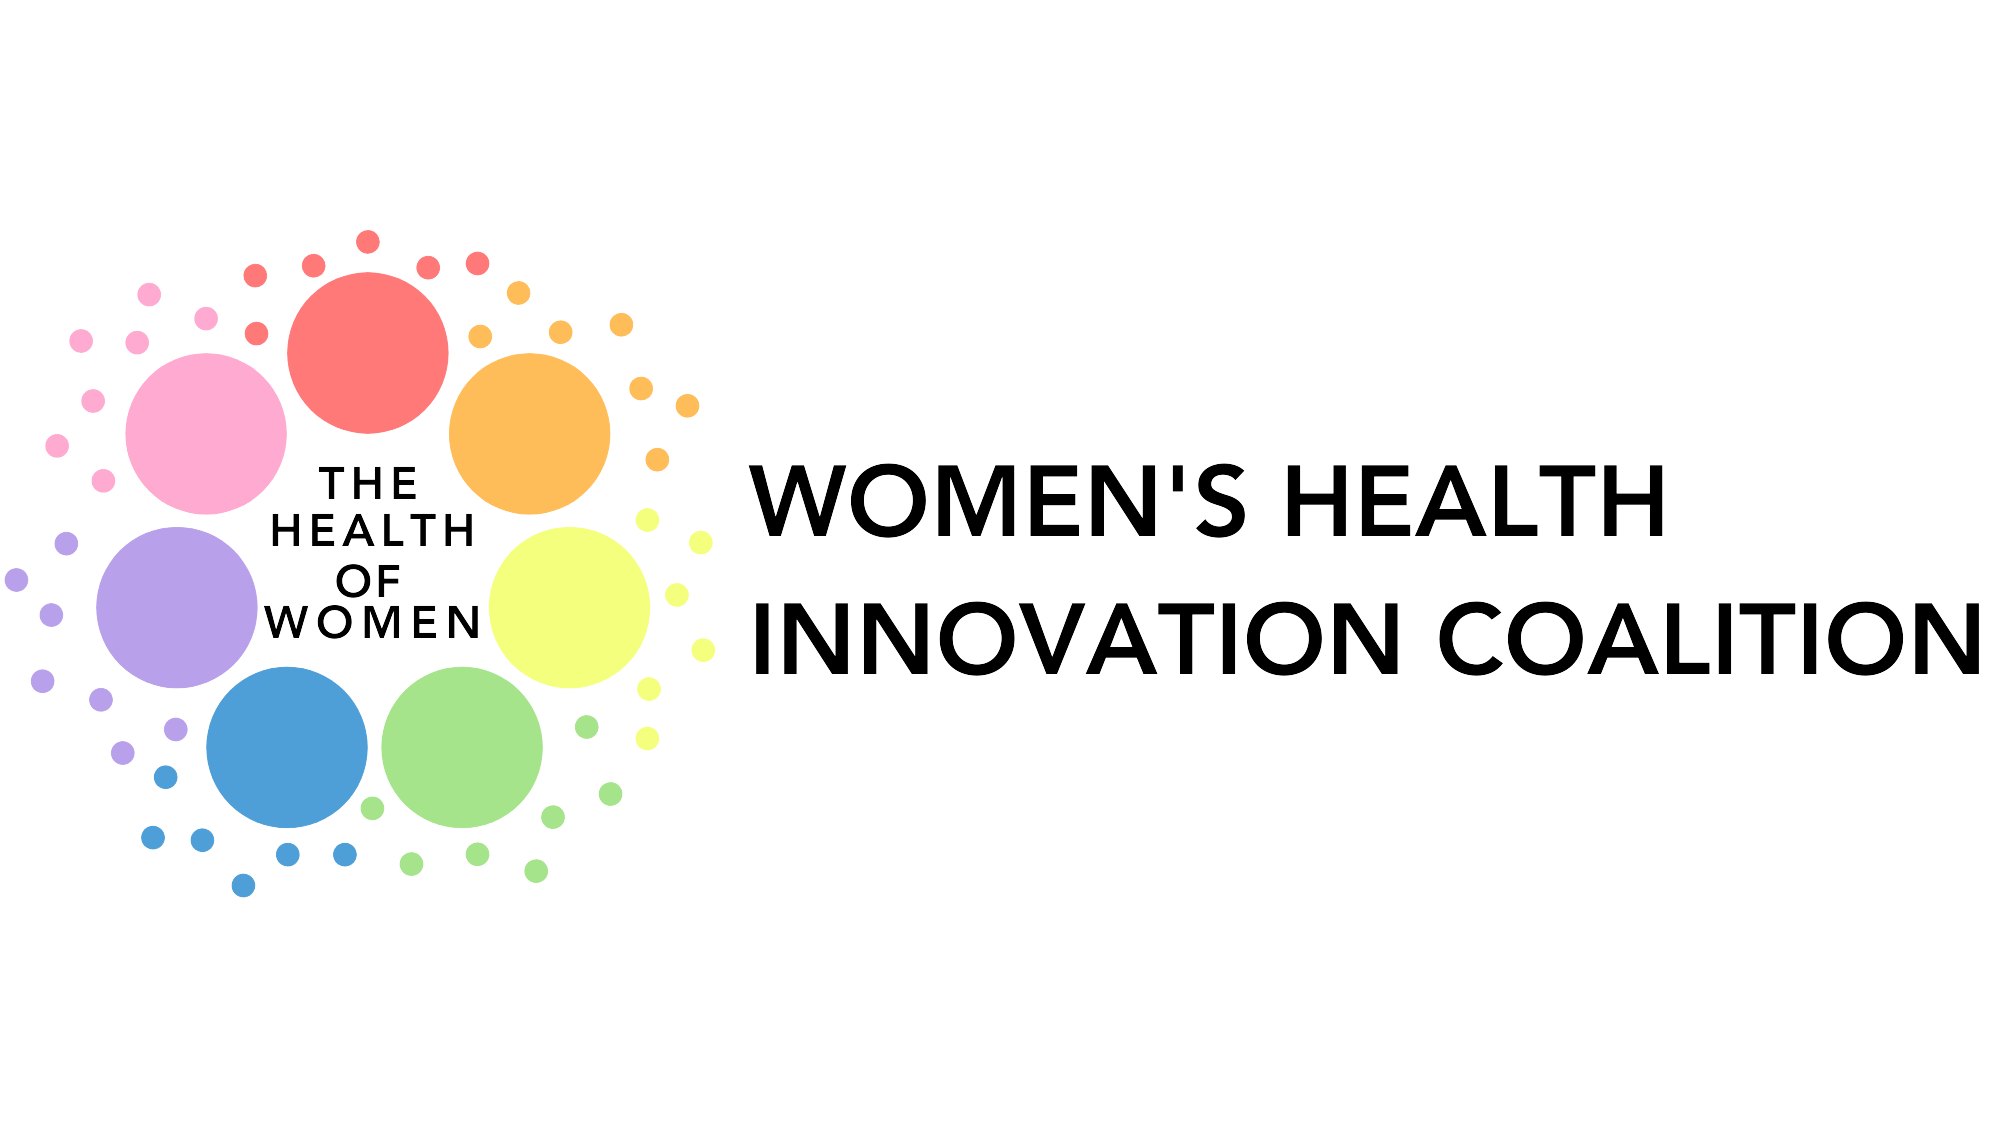 Women's Health Innovation Coalition